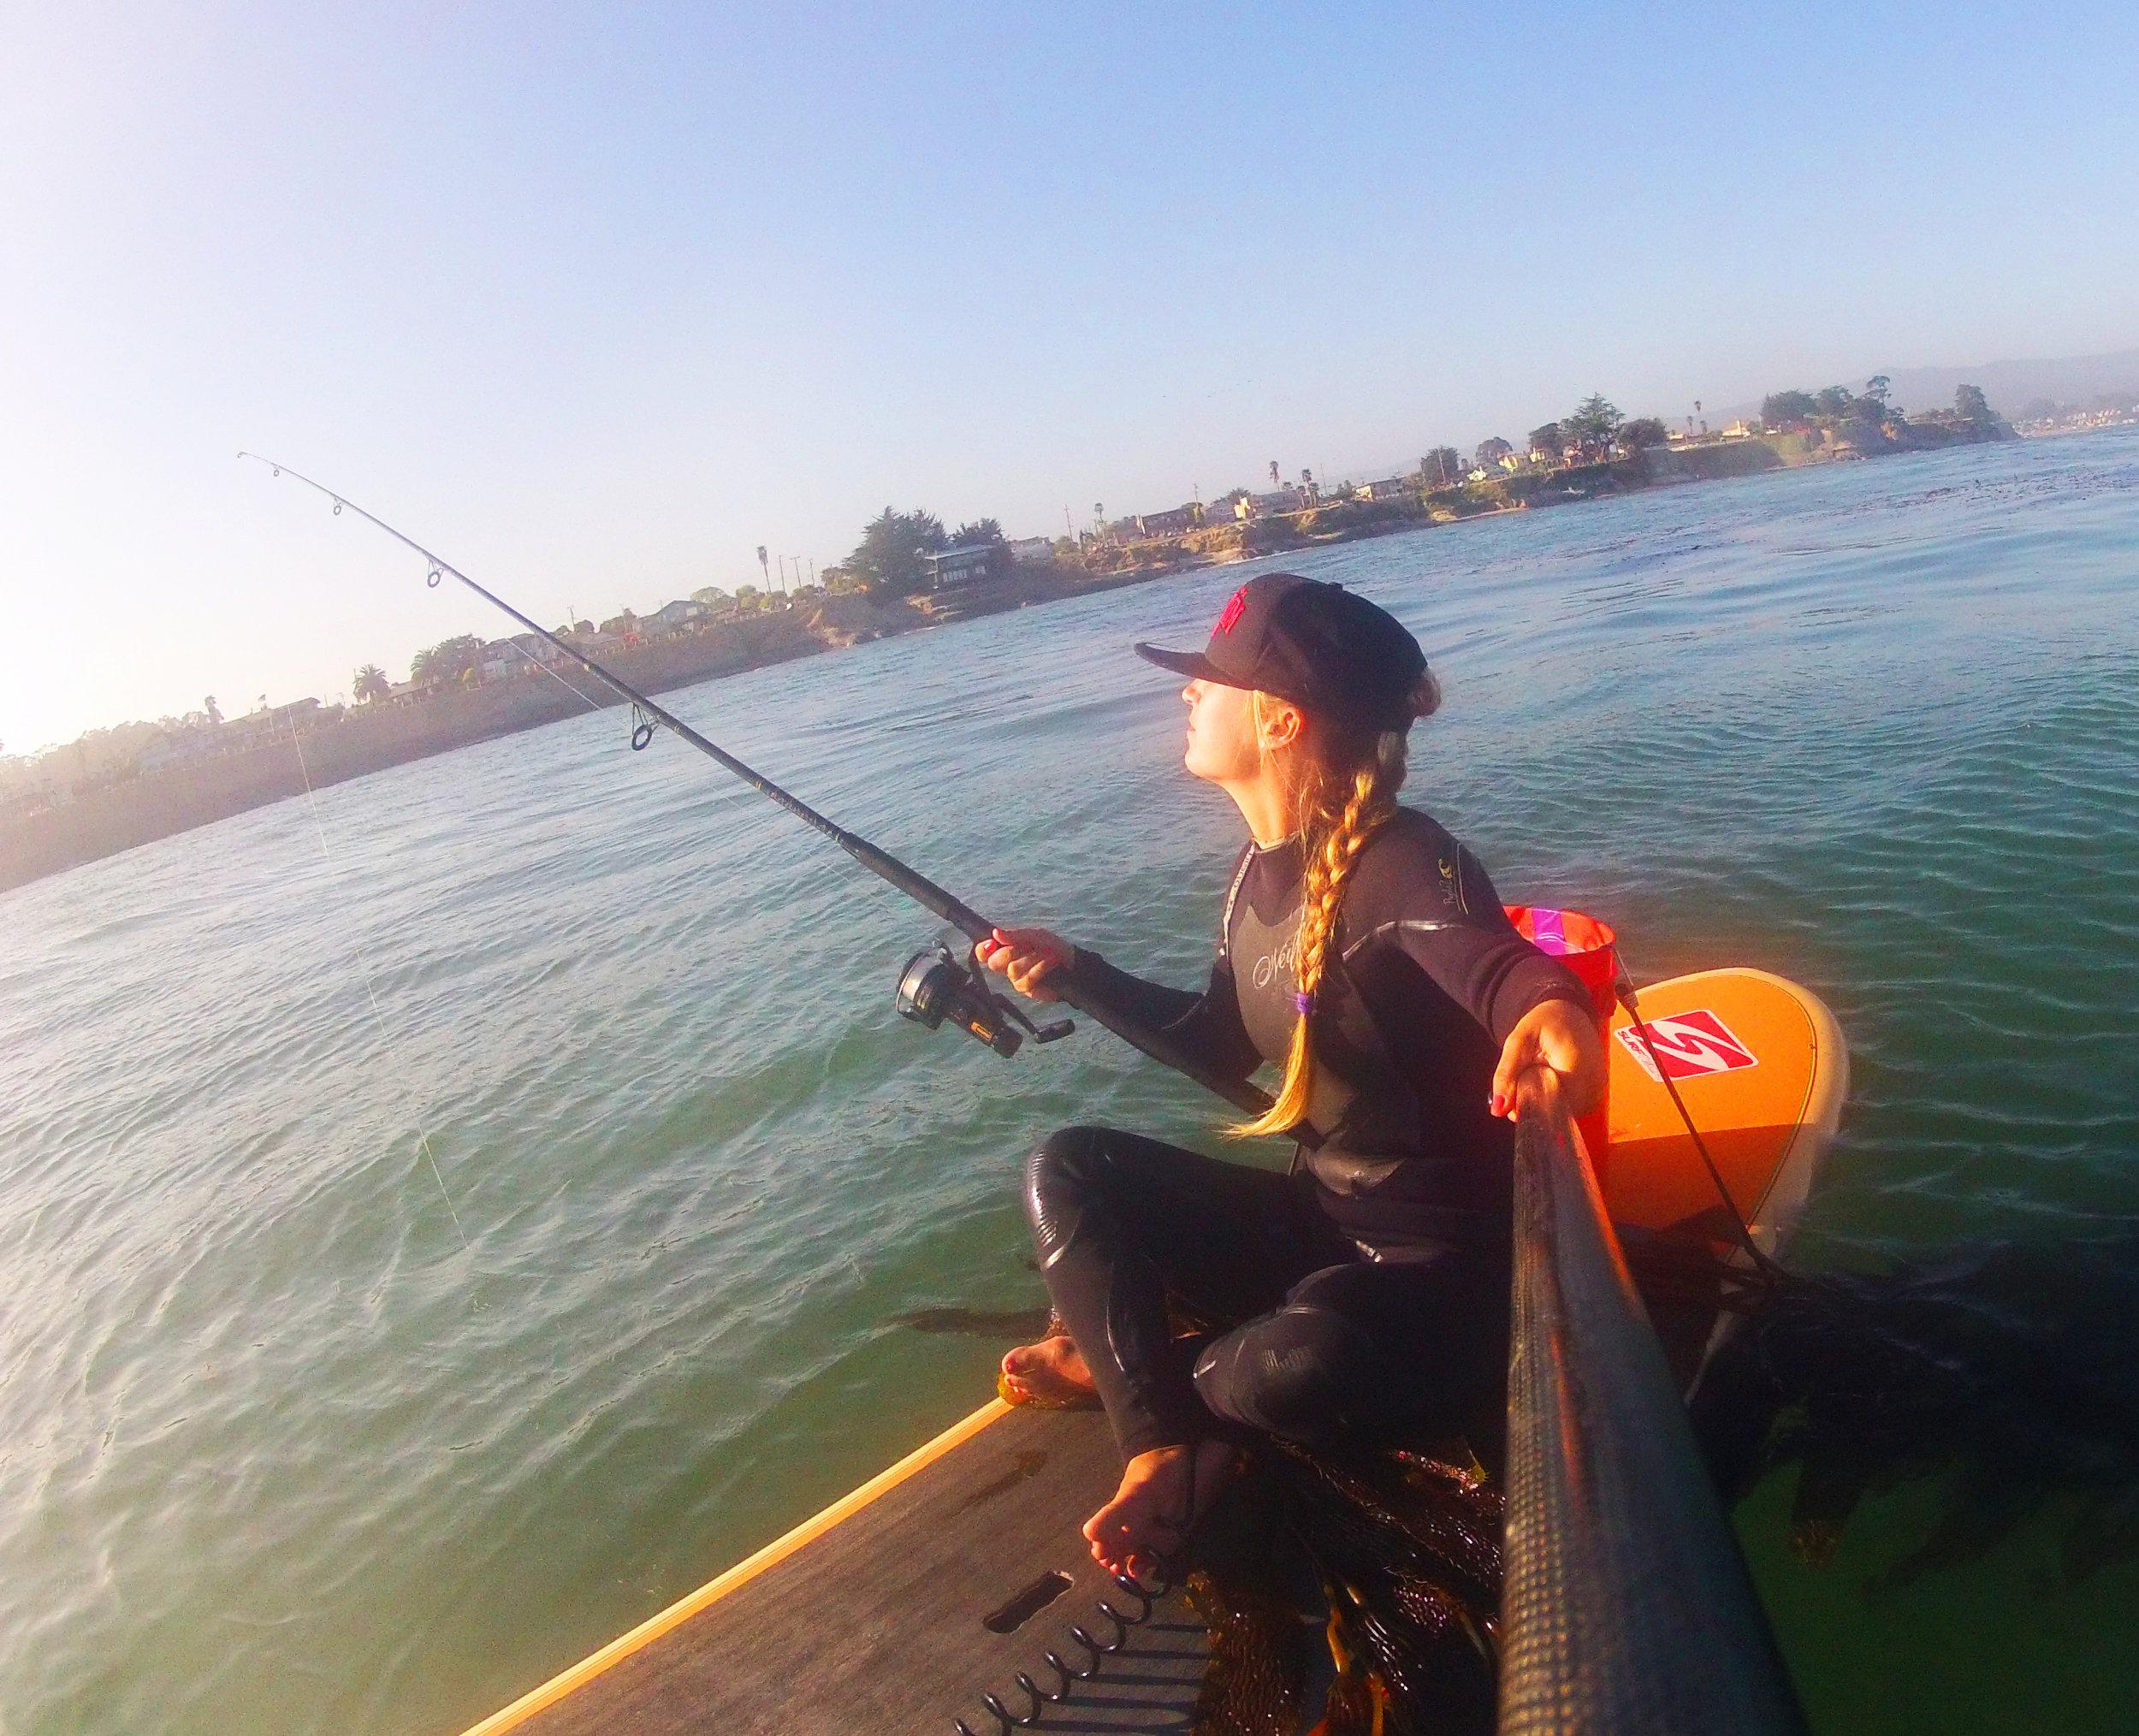 Paddleboard fishing off of Pleasure Point, Santa Cruz, for rock cod and halibut.